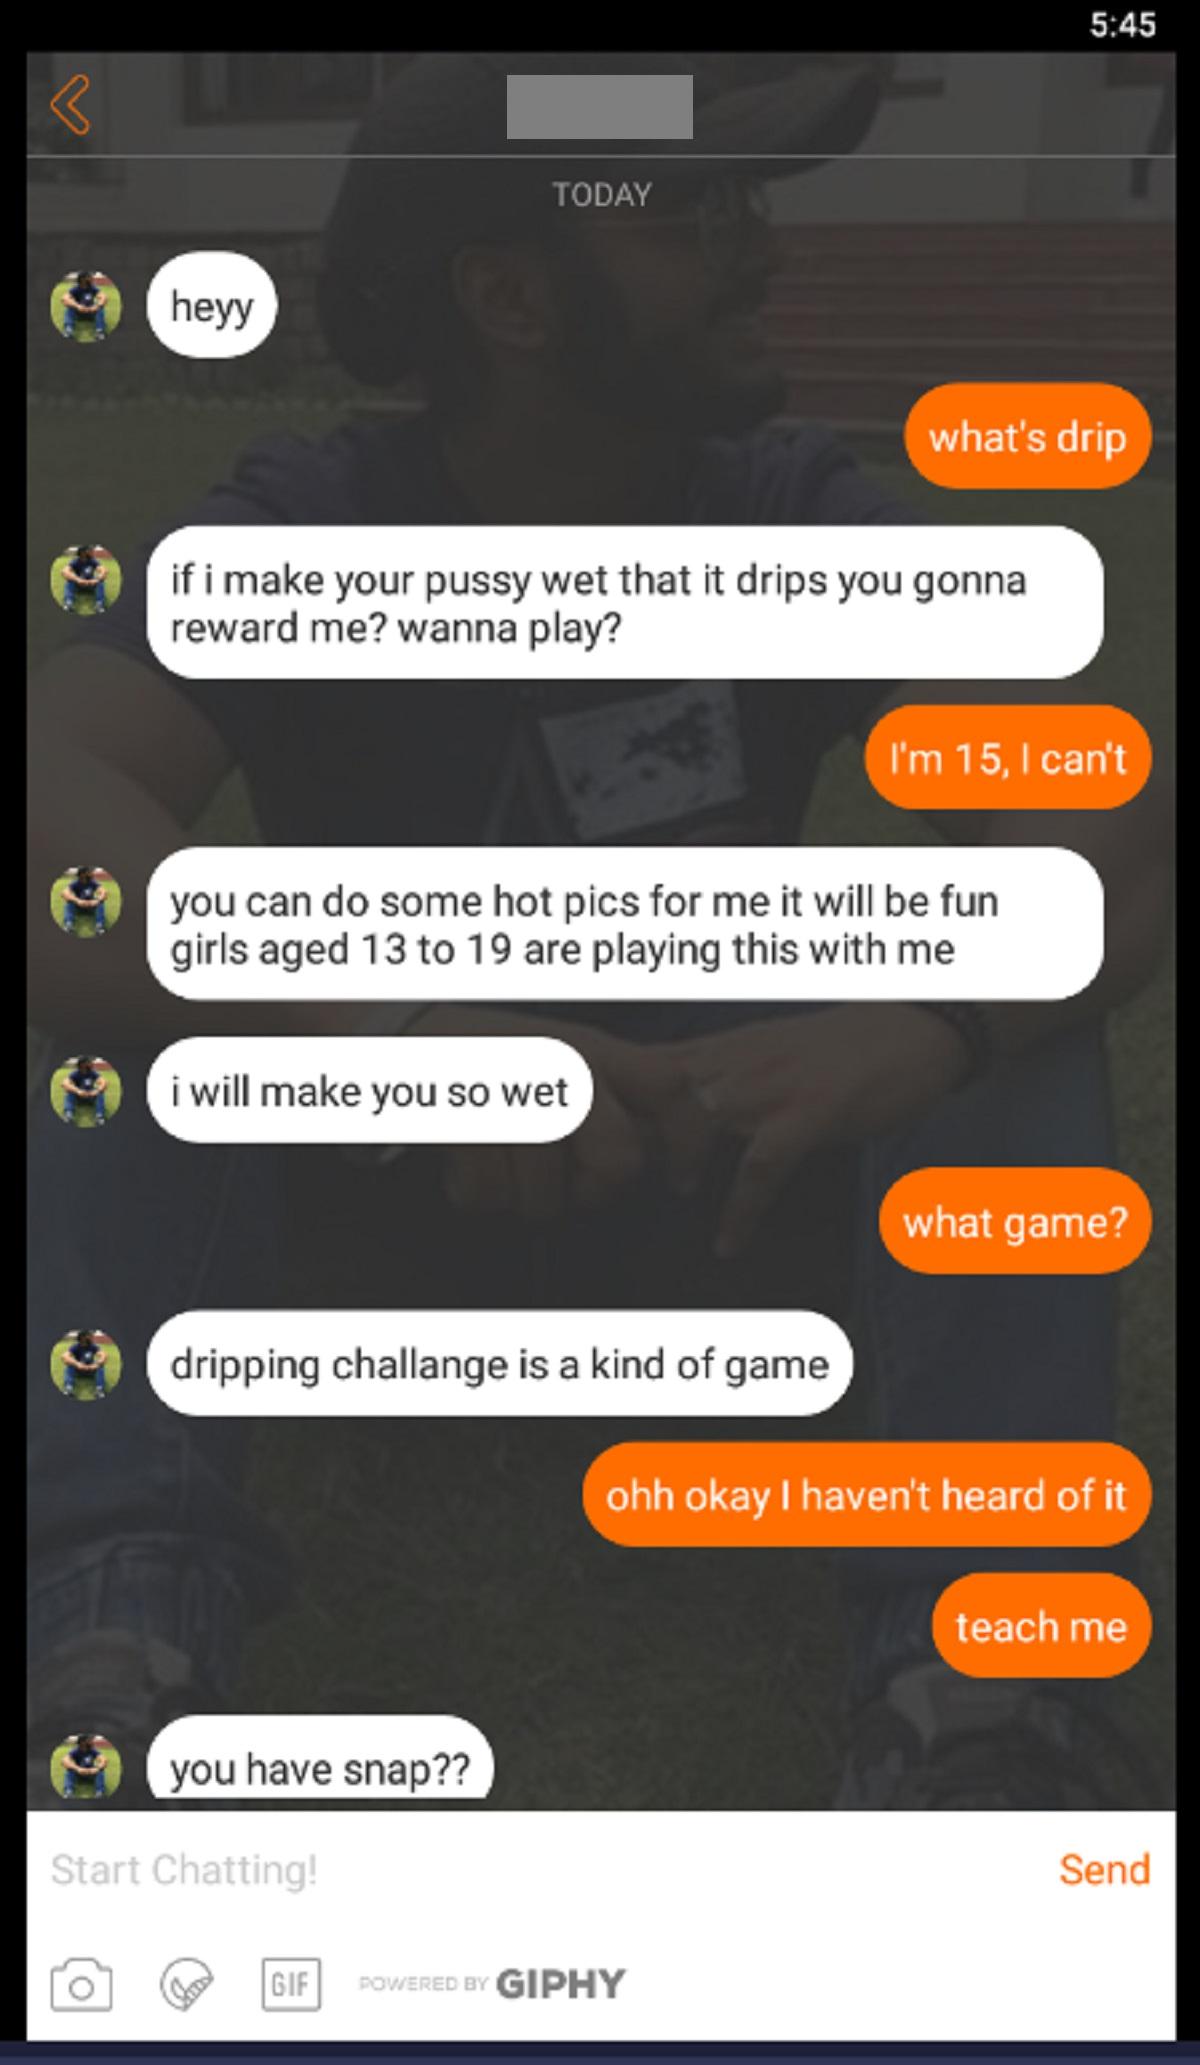 MyLOL Conversation with Male